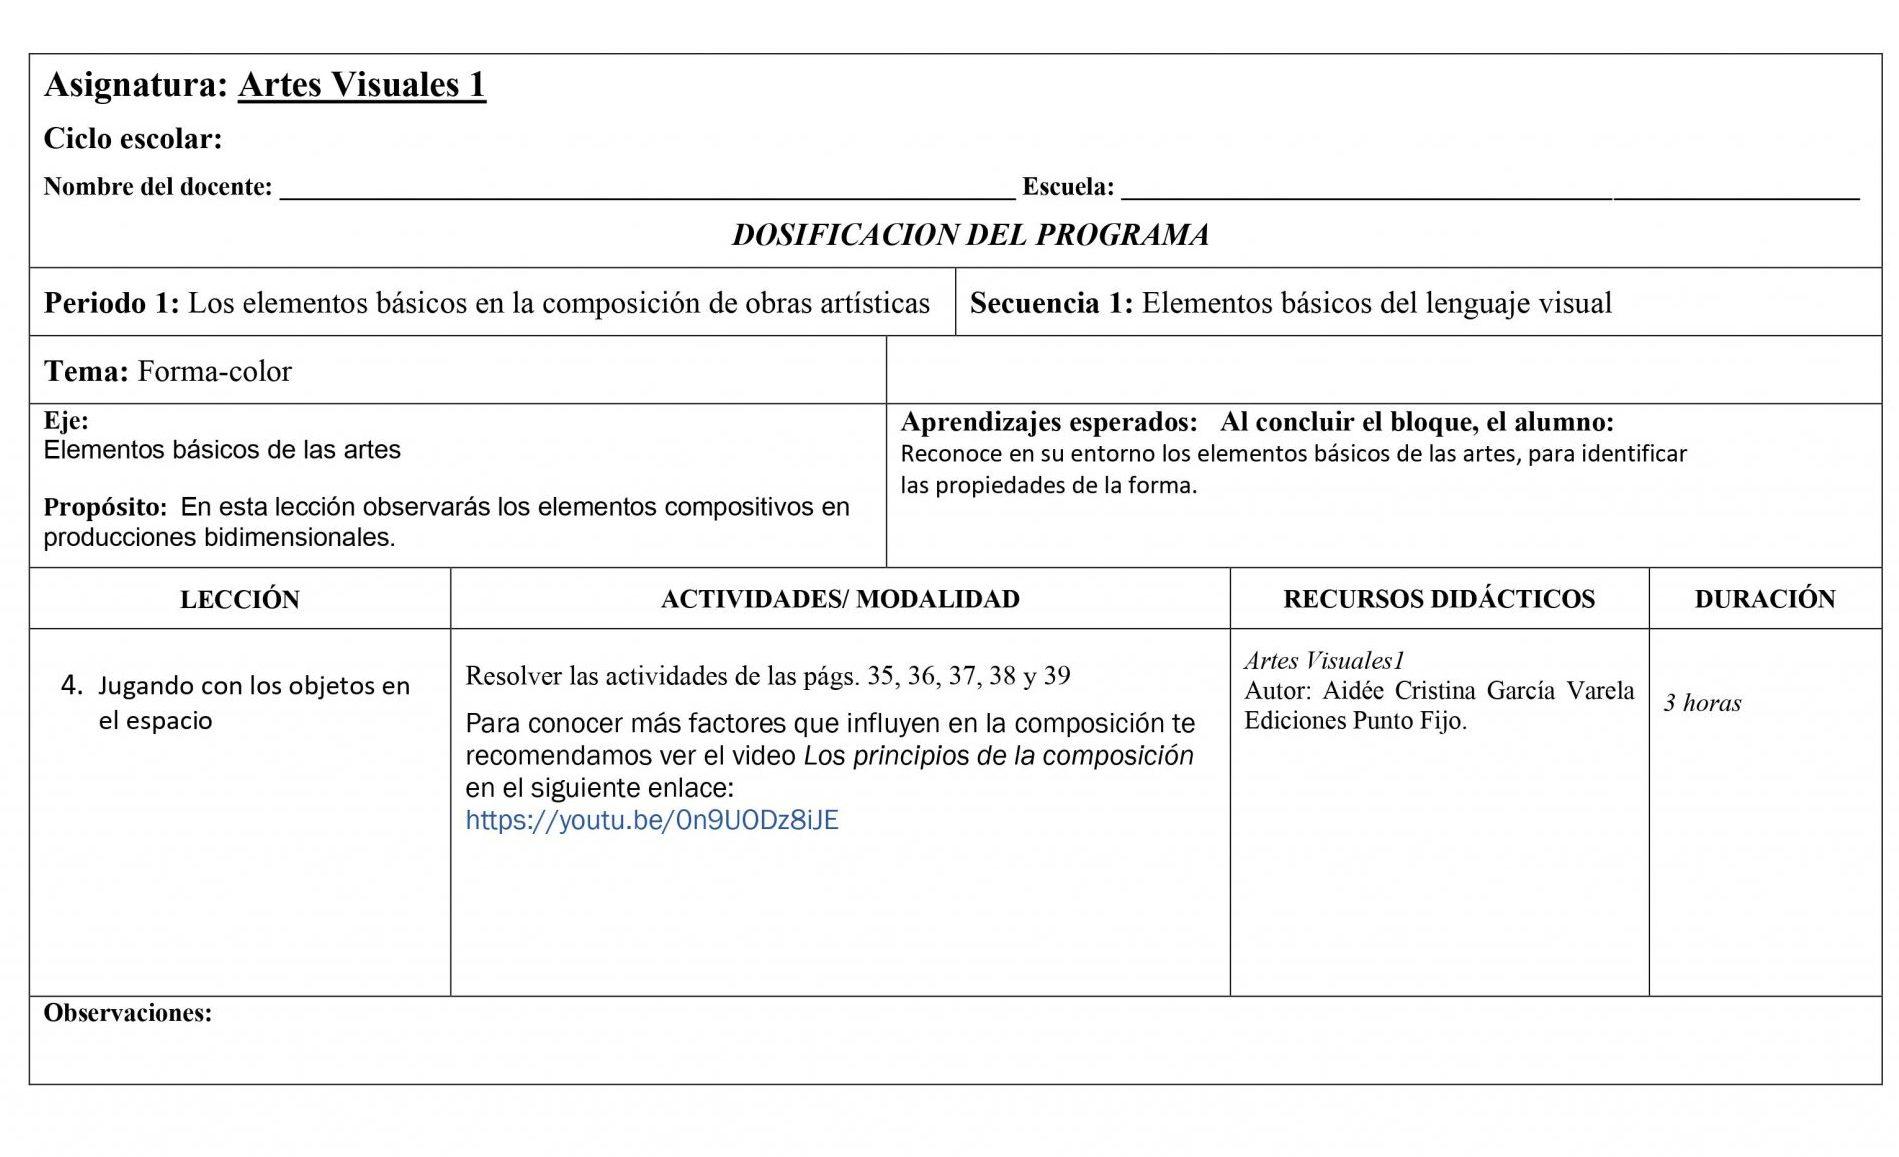 Dosificación Artes Visuales 1 Secundaria 04